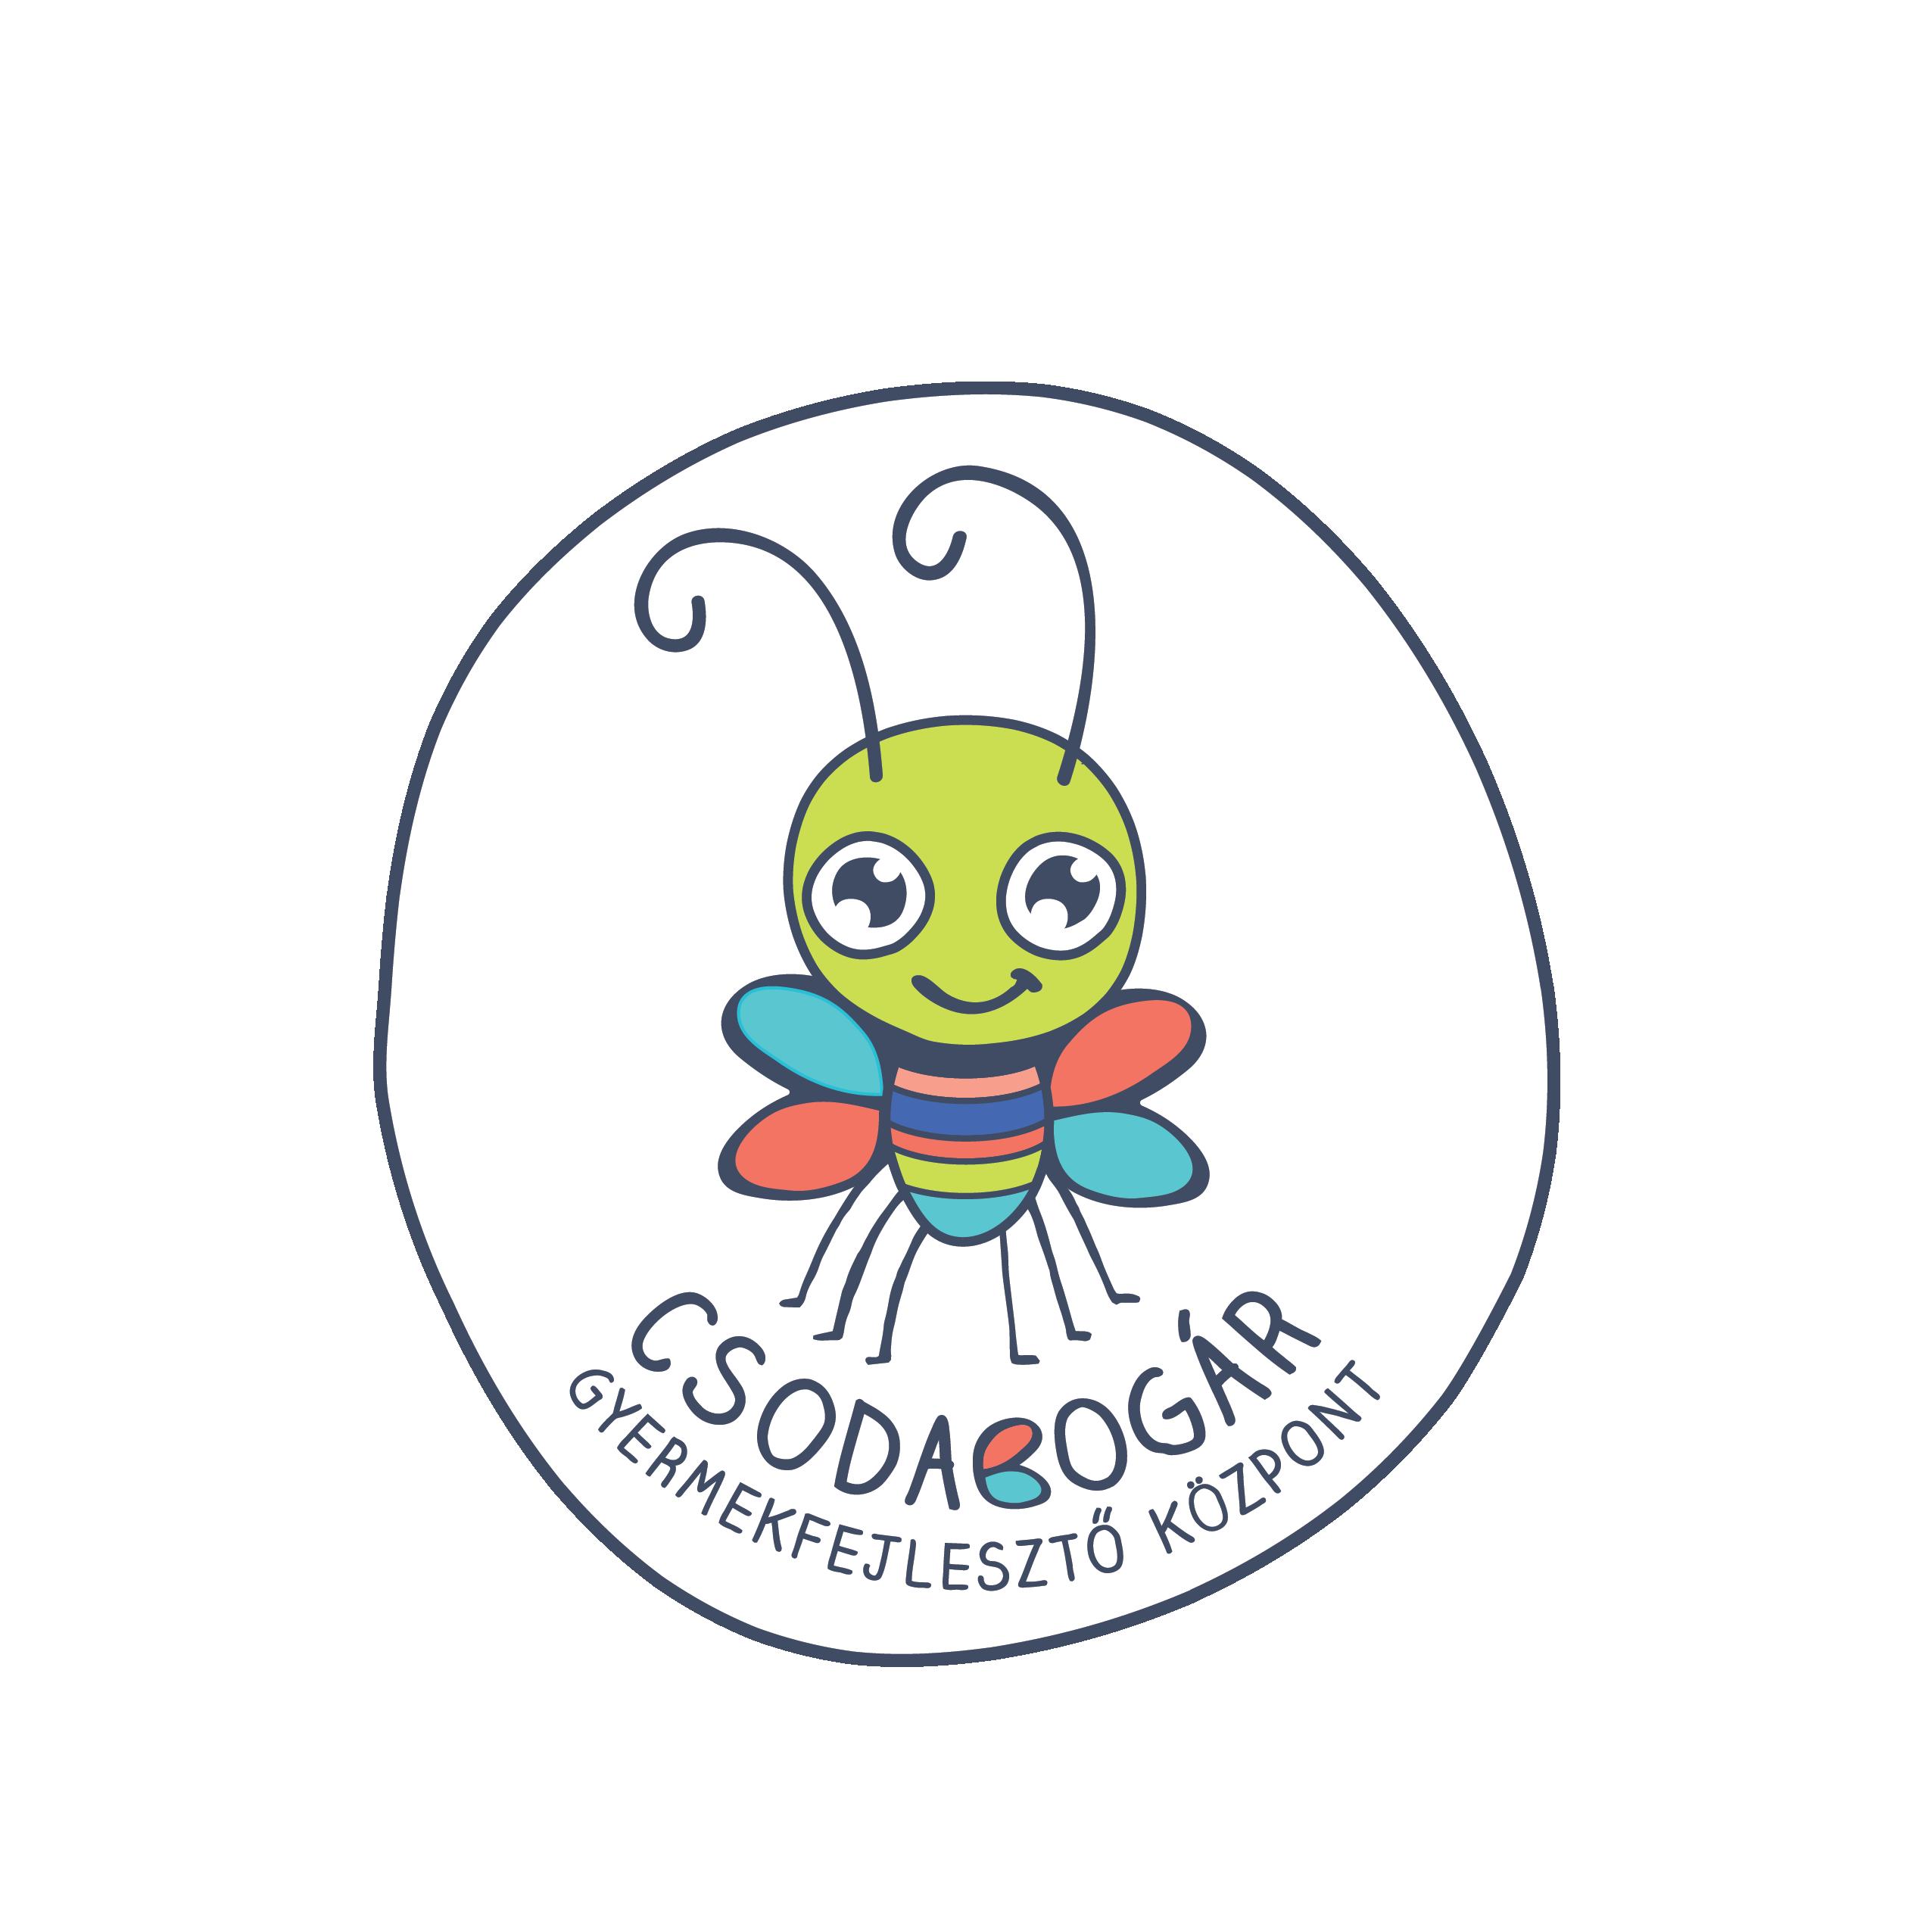 _LOGO_csodabogar-02